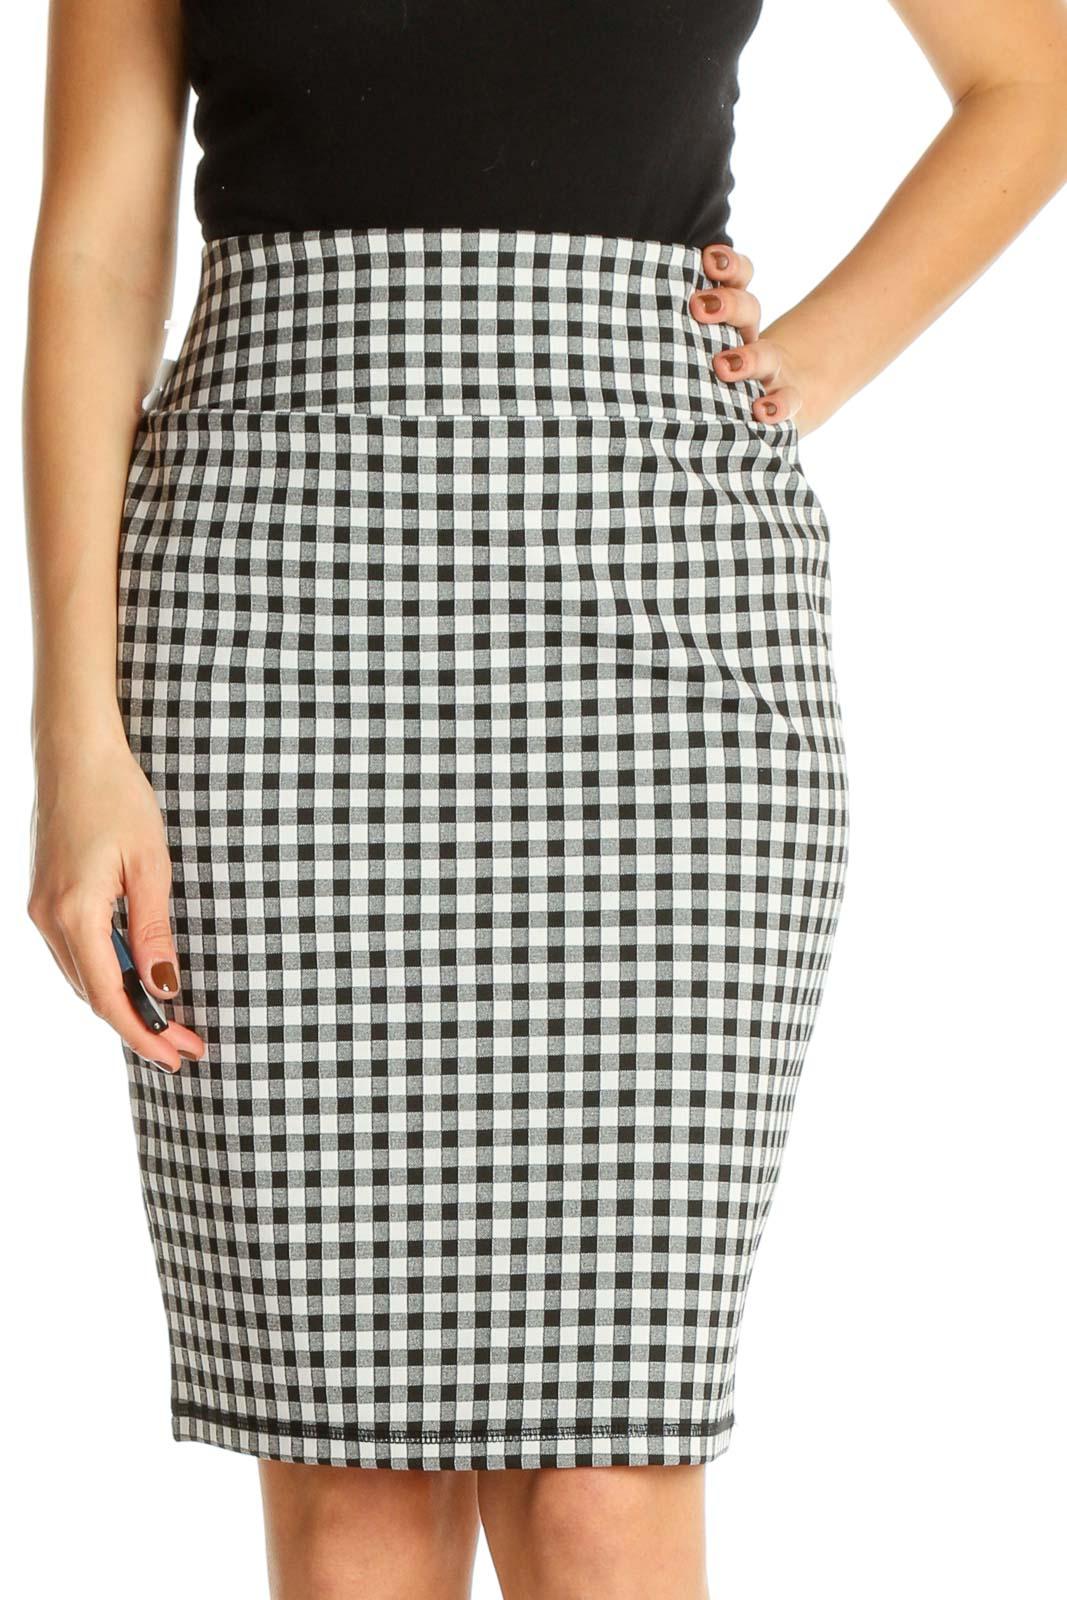 White Checkered Brunch Pencil Skirt Front